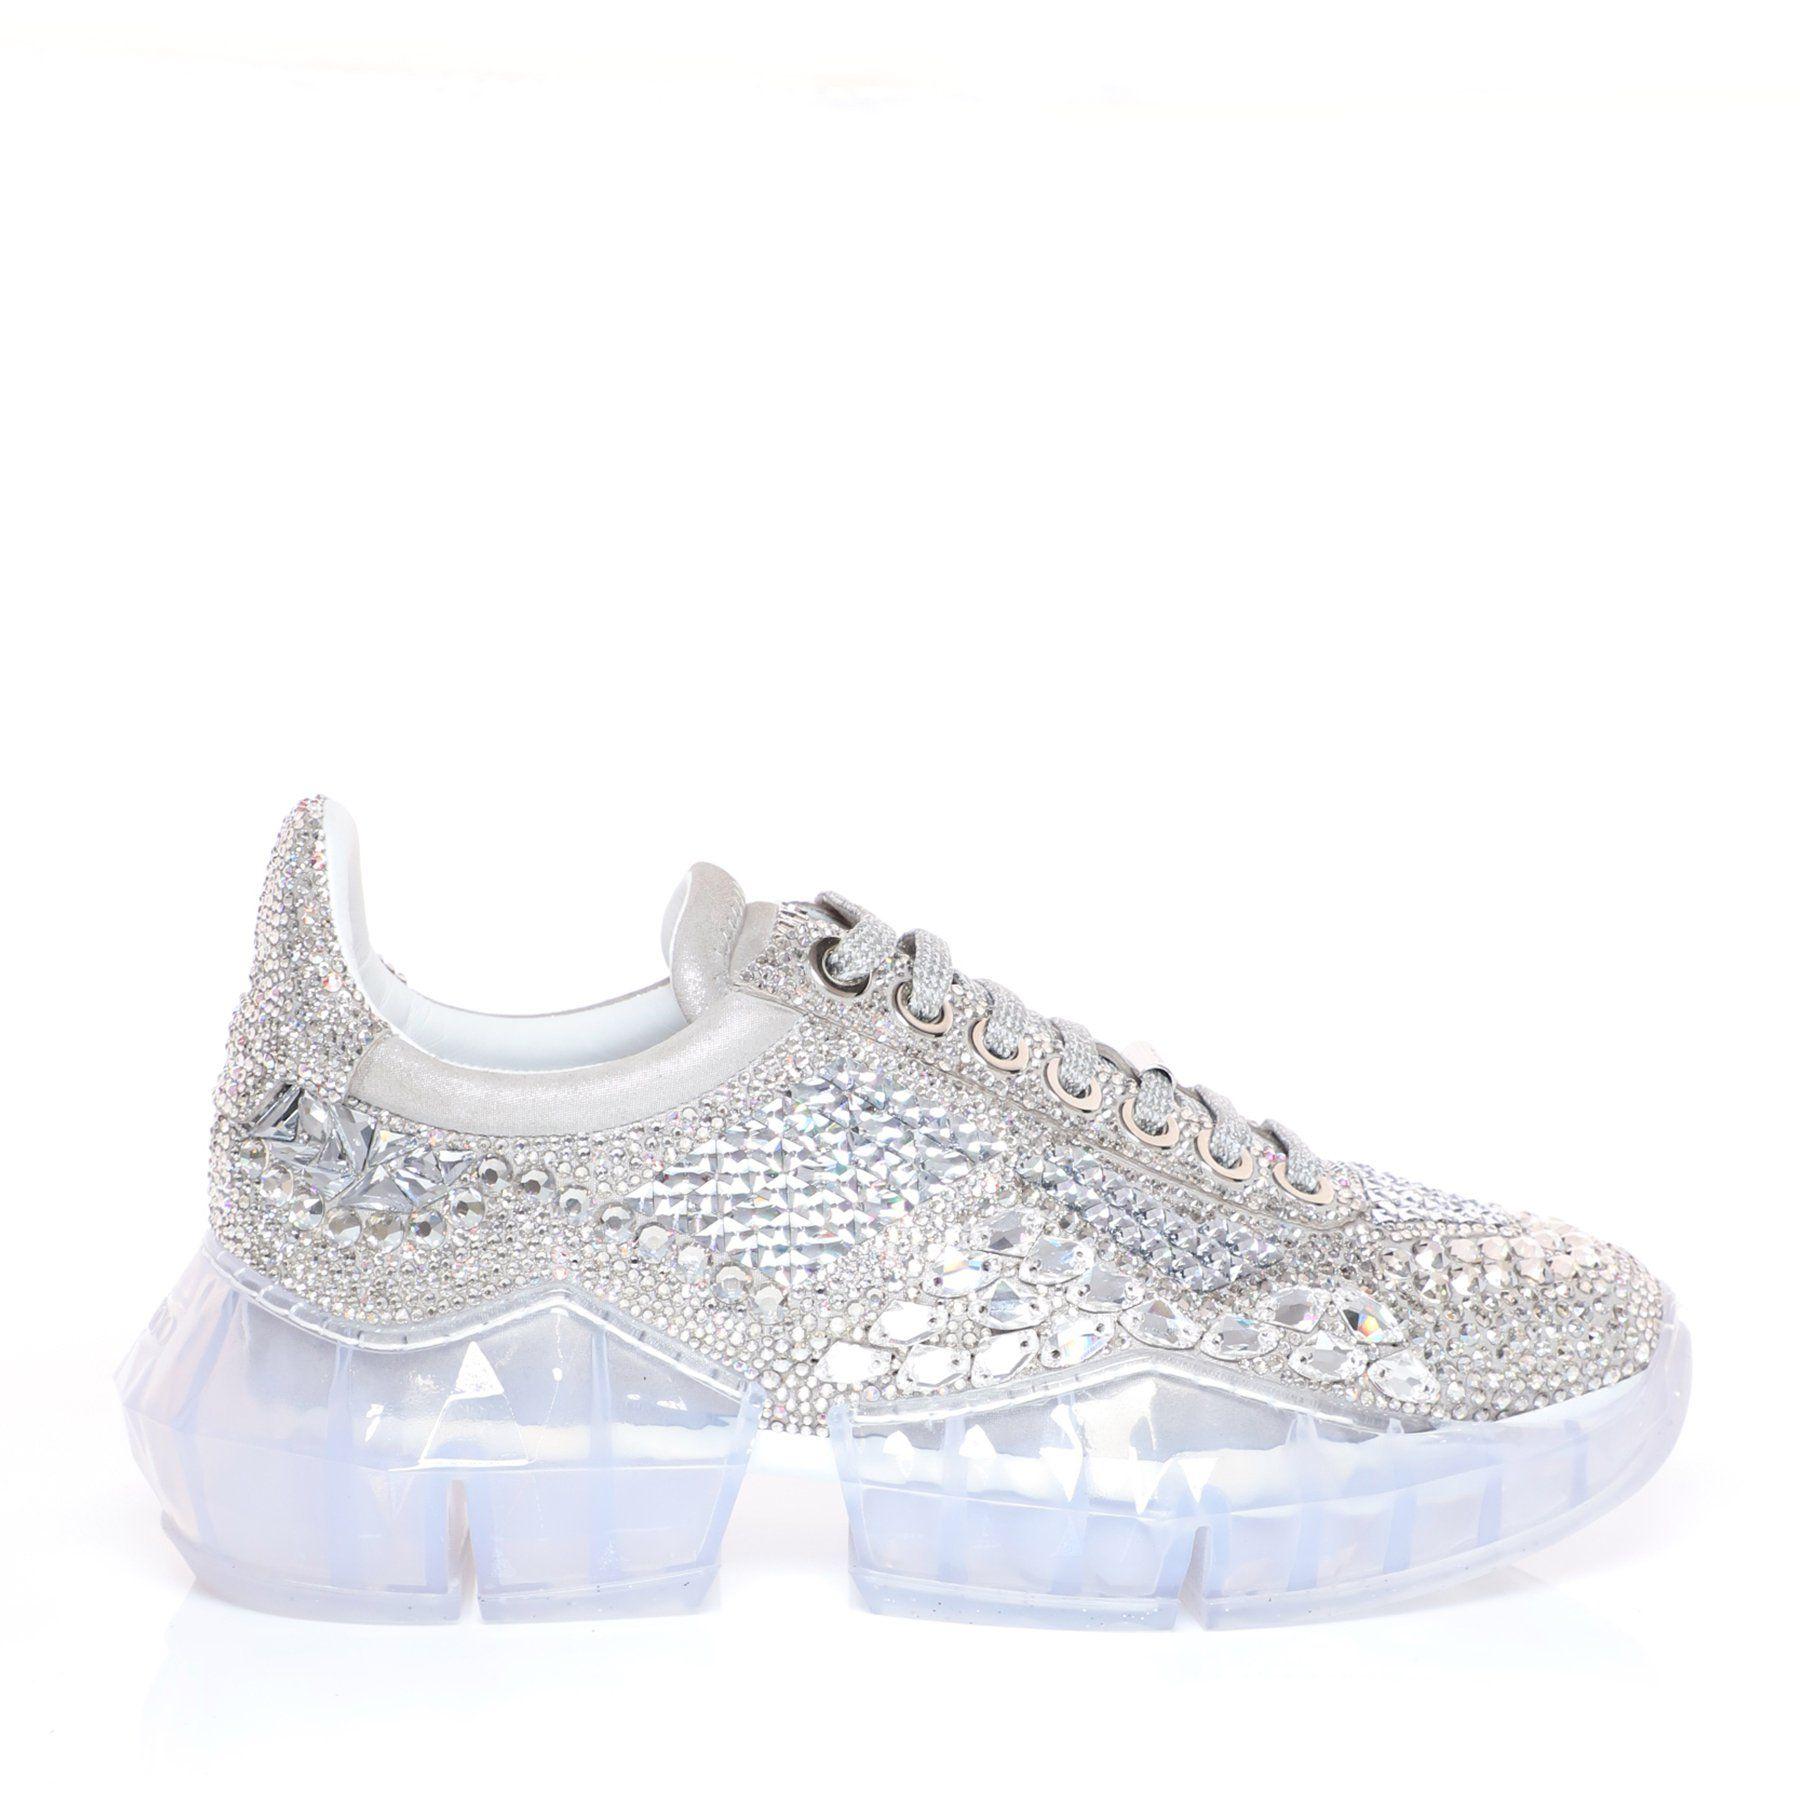 DIAMOND/F | Jimmy choo sneakers